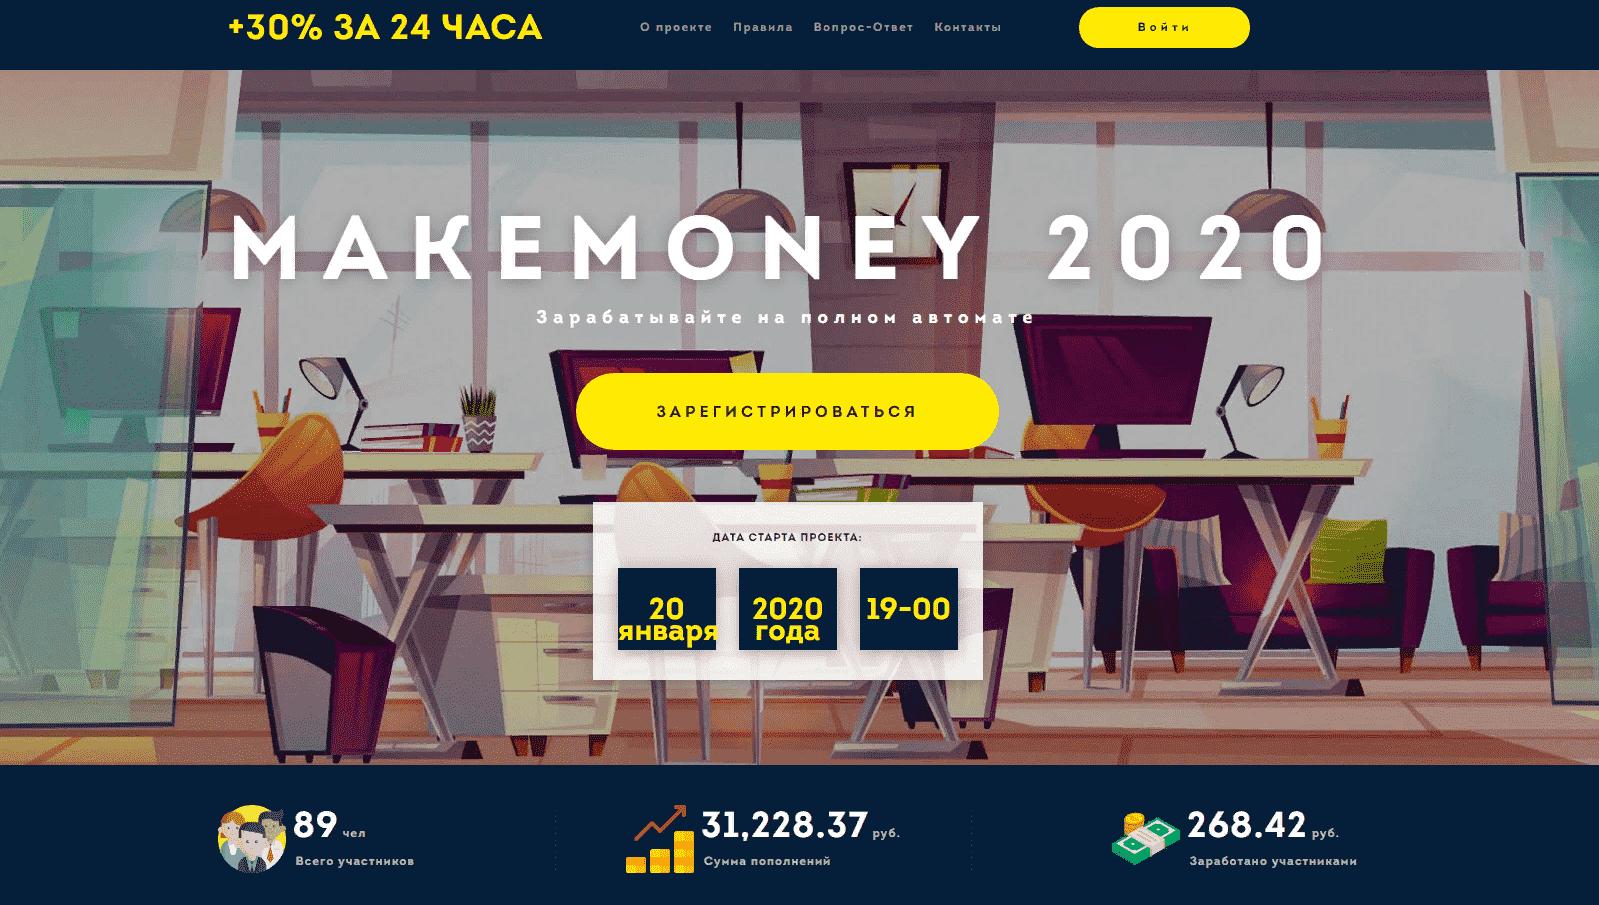 MAKEMONEY 2020